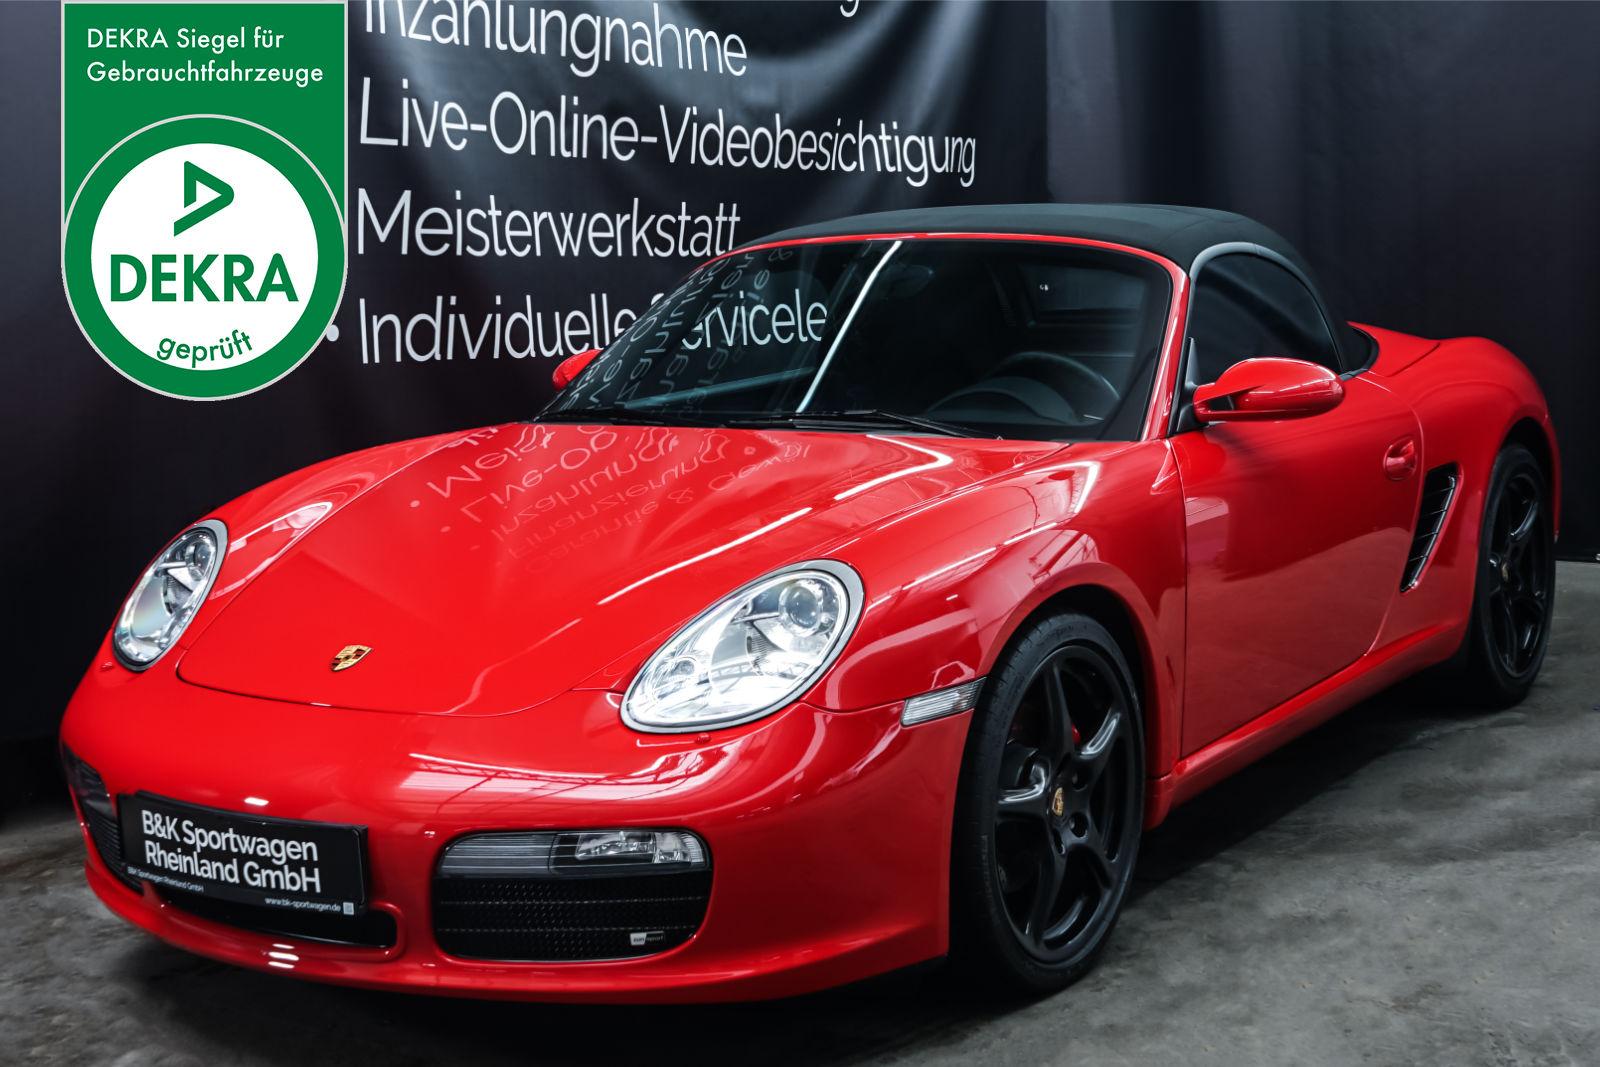 Porsche_BoxsterS_Rot_Schwarz_POR-3248_Plakette_w